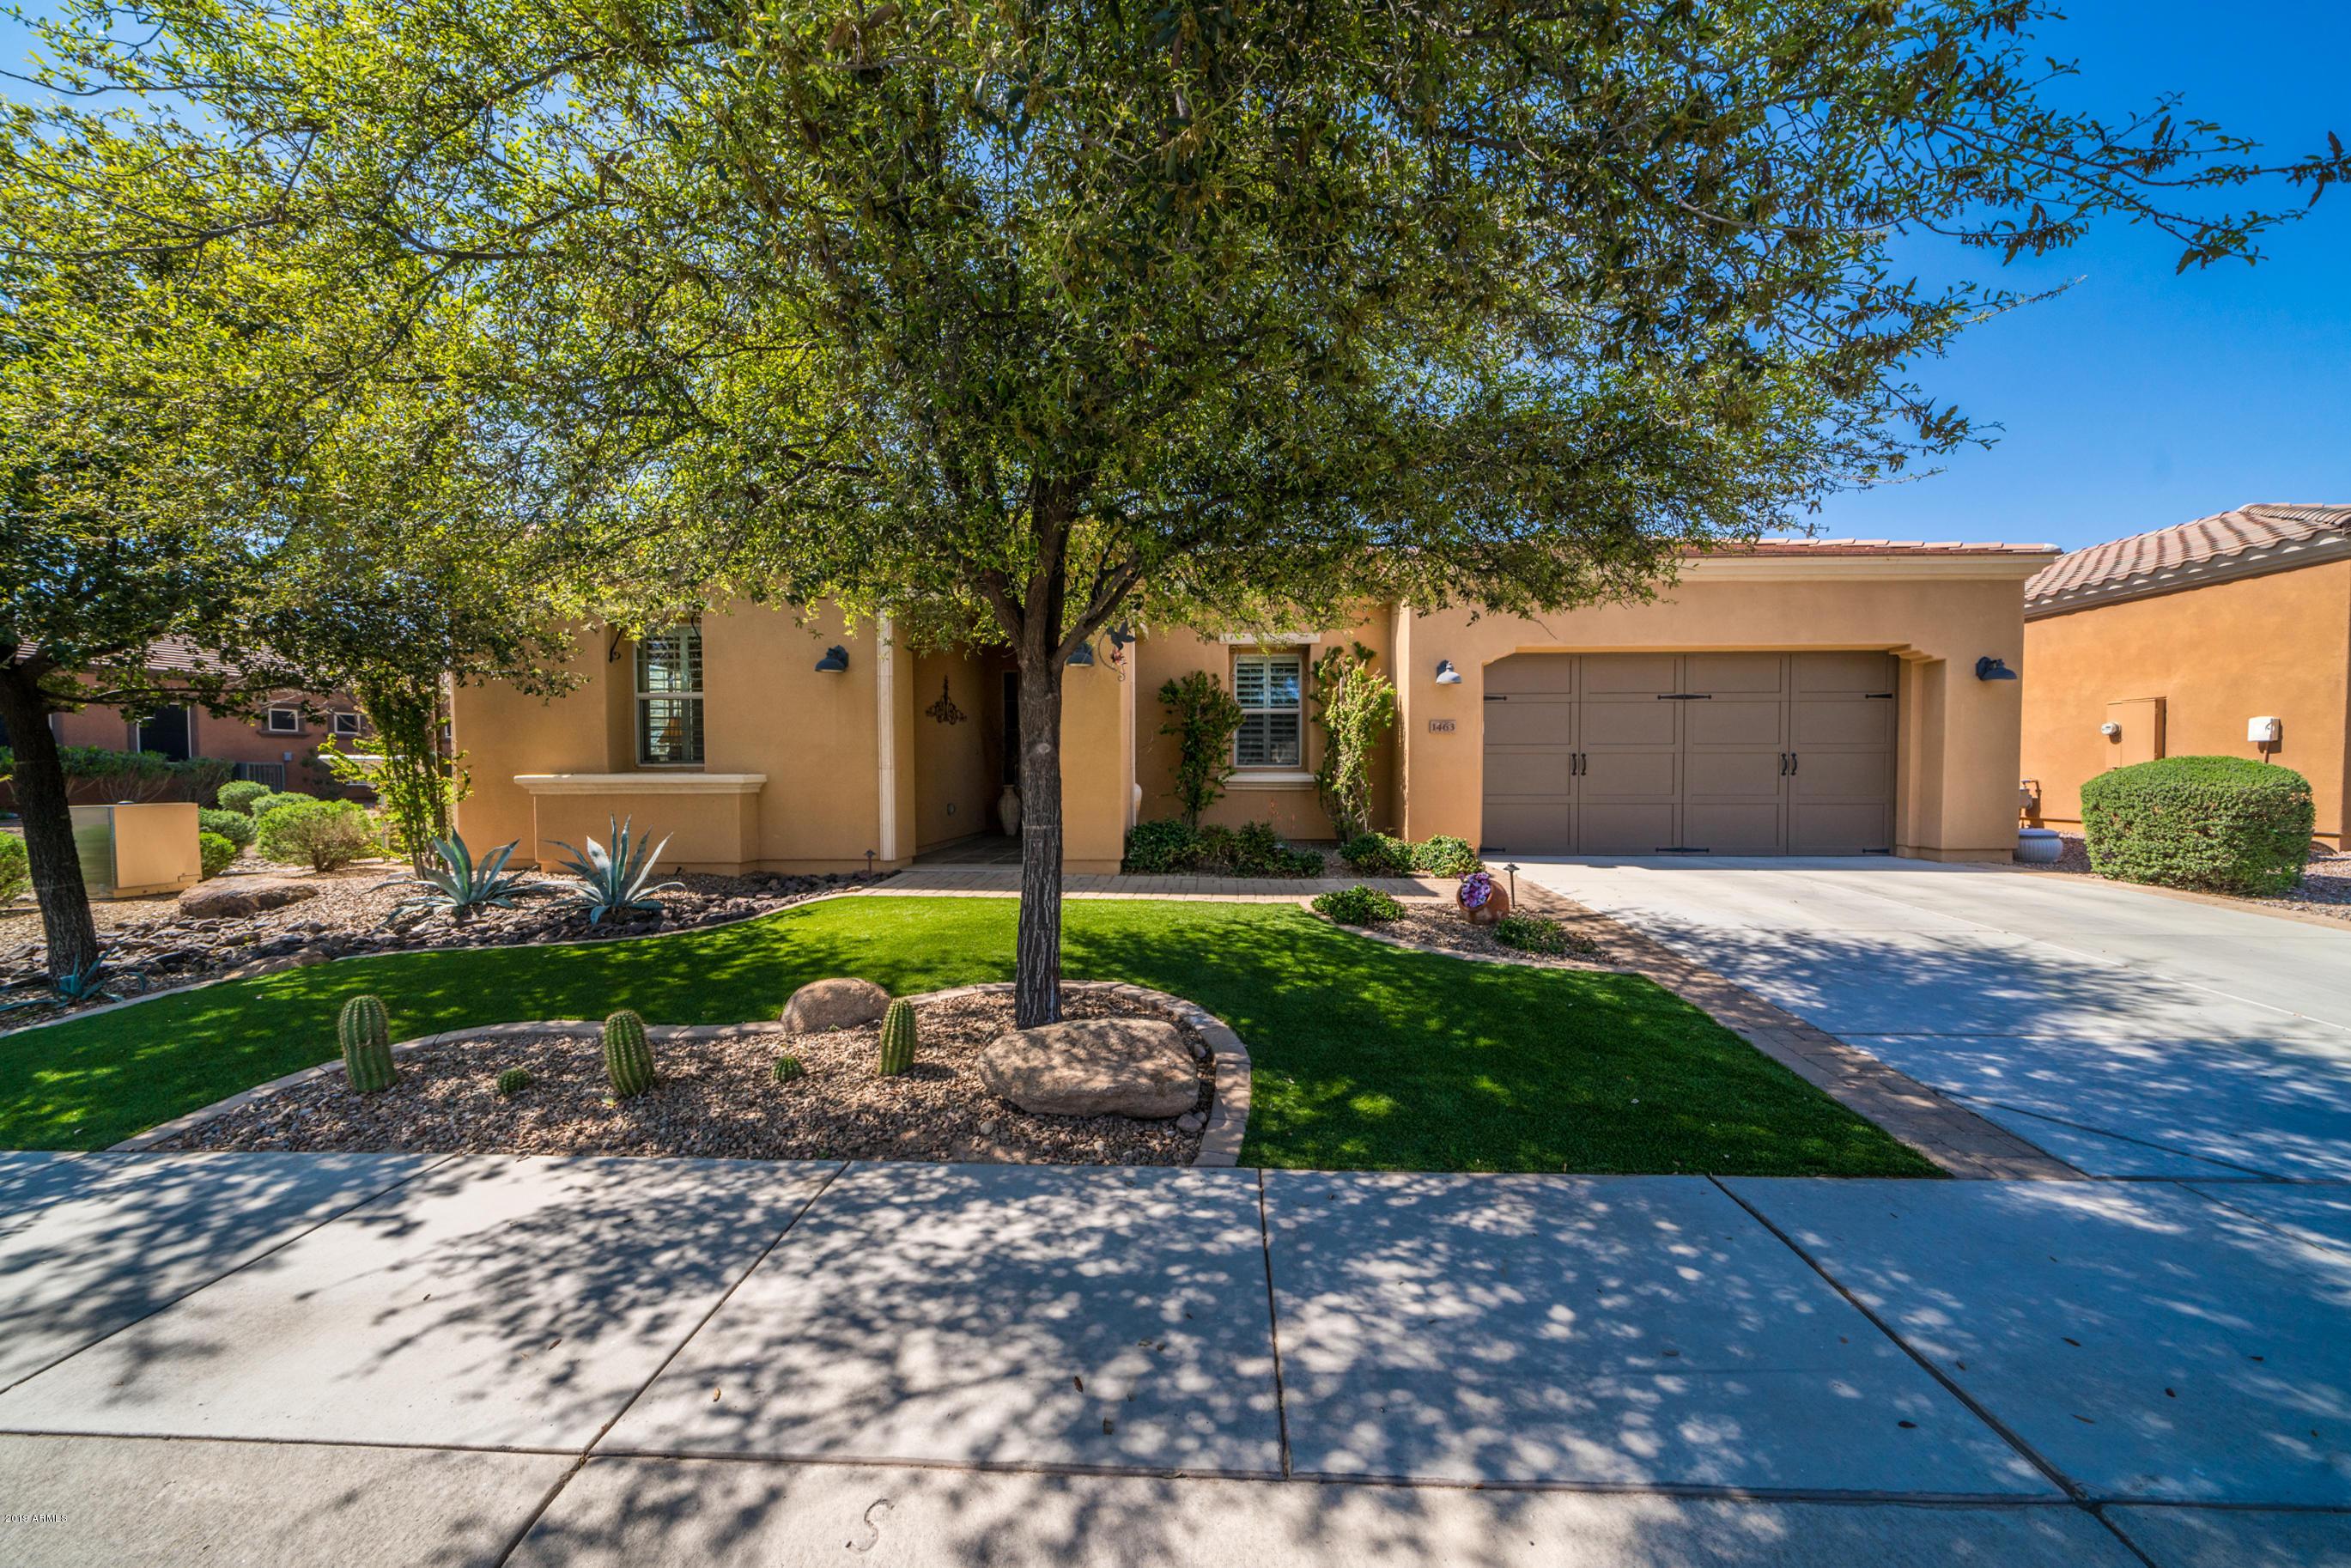 Photo of 1463 E SWEET CITRUS Drive, San Tan Valley, AZ 85140